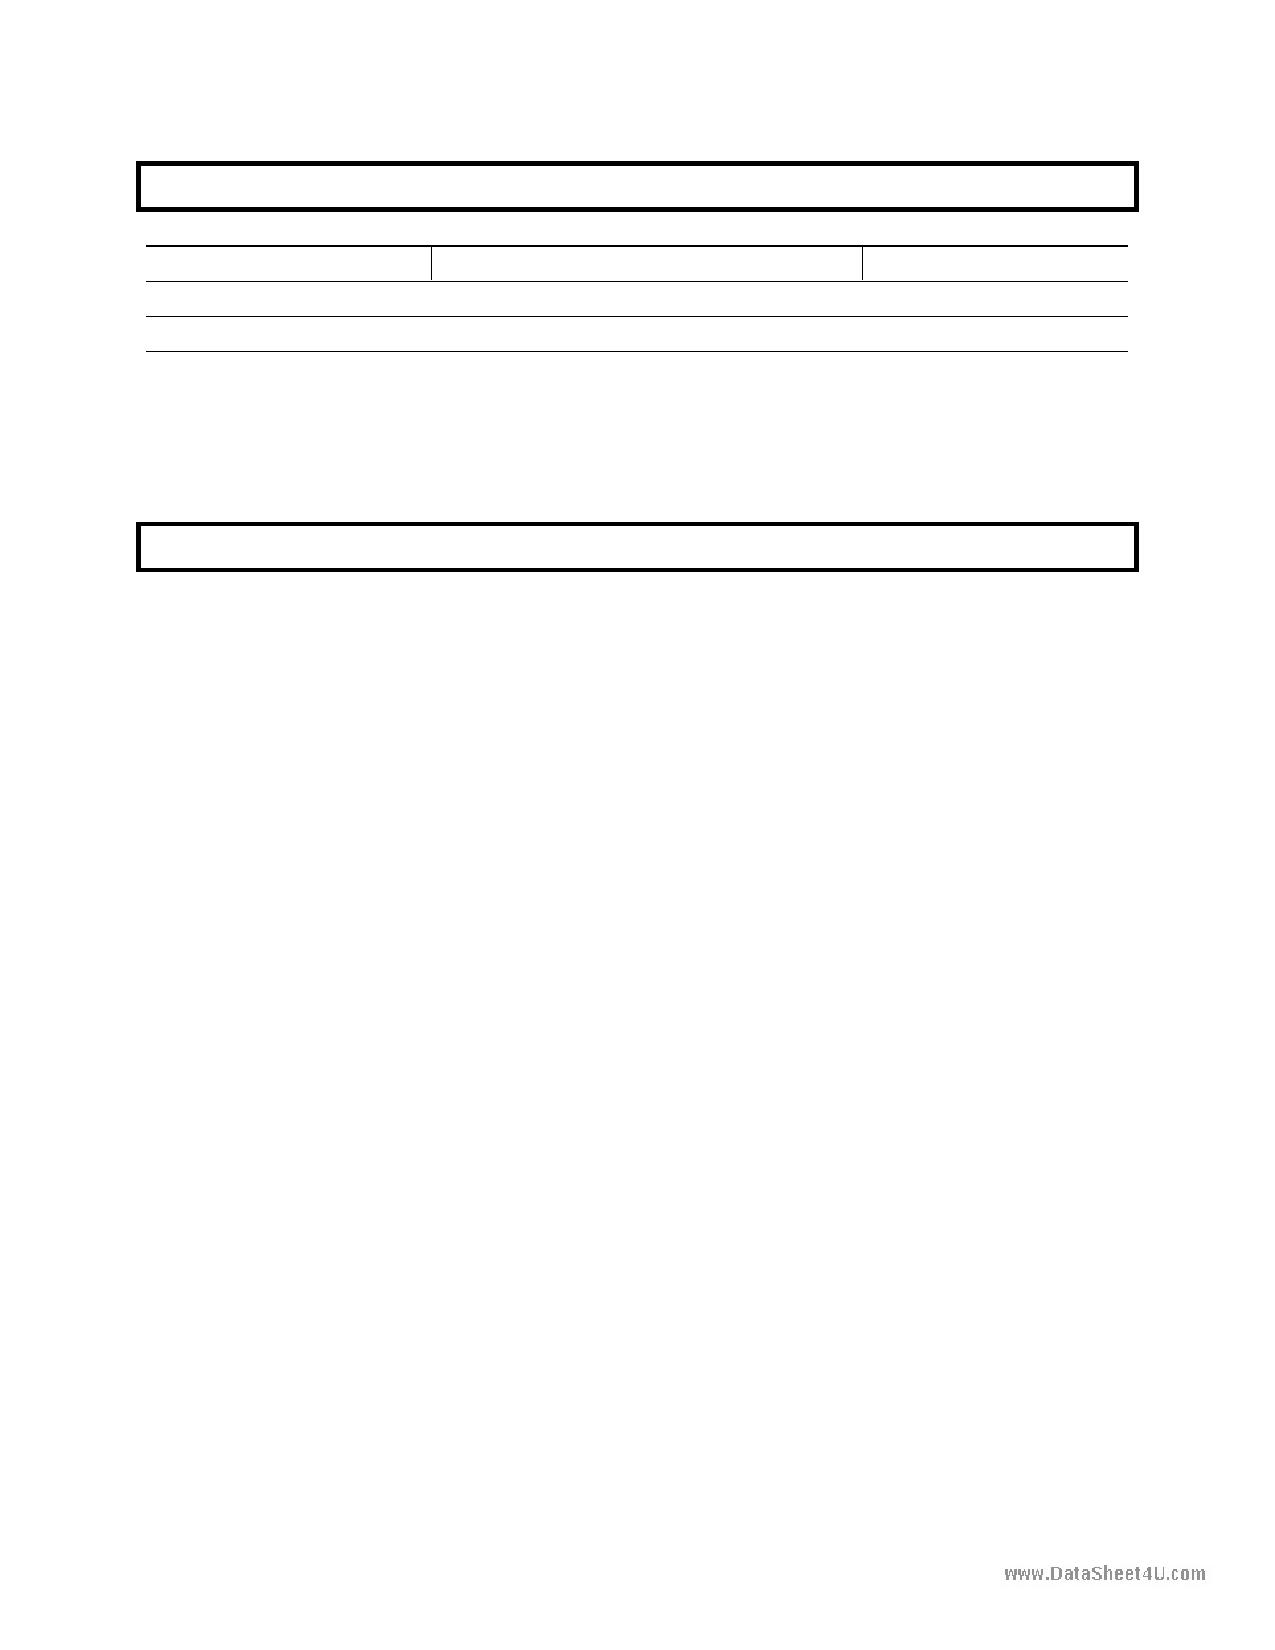 P-4602-F pdf